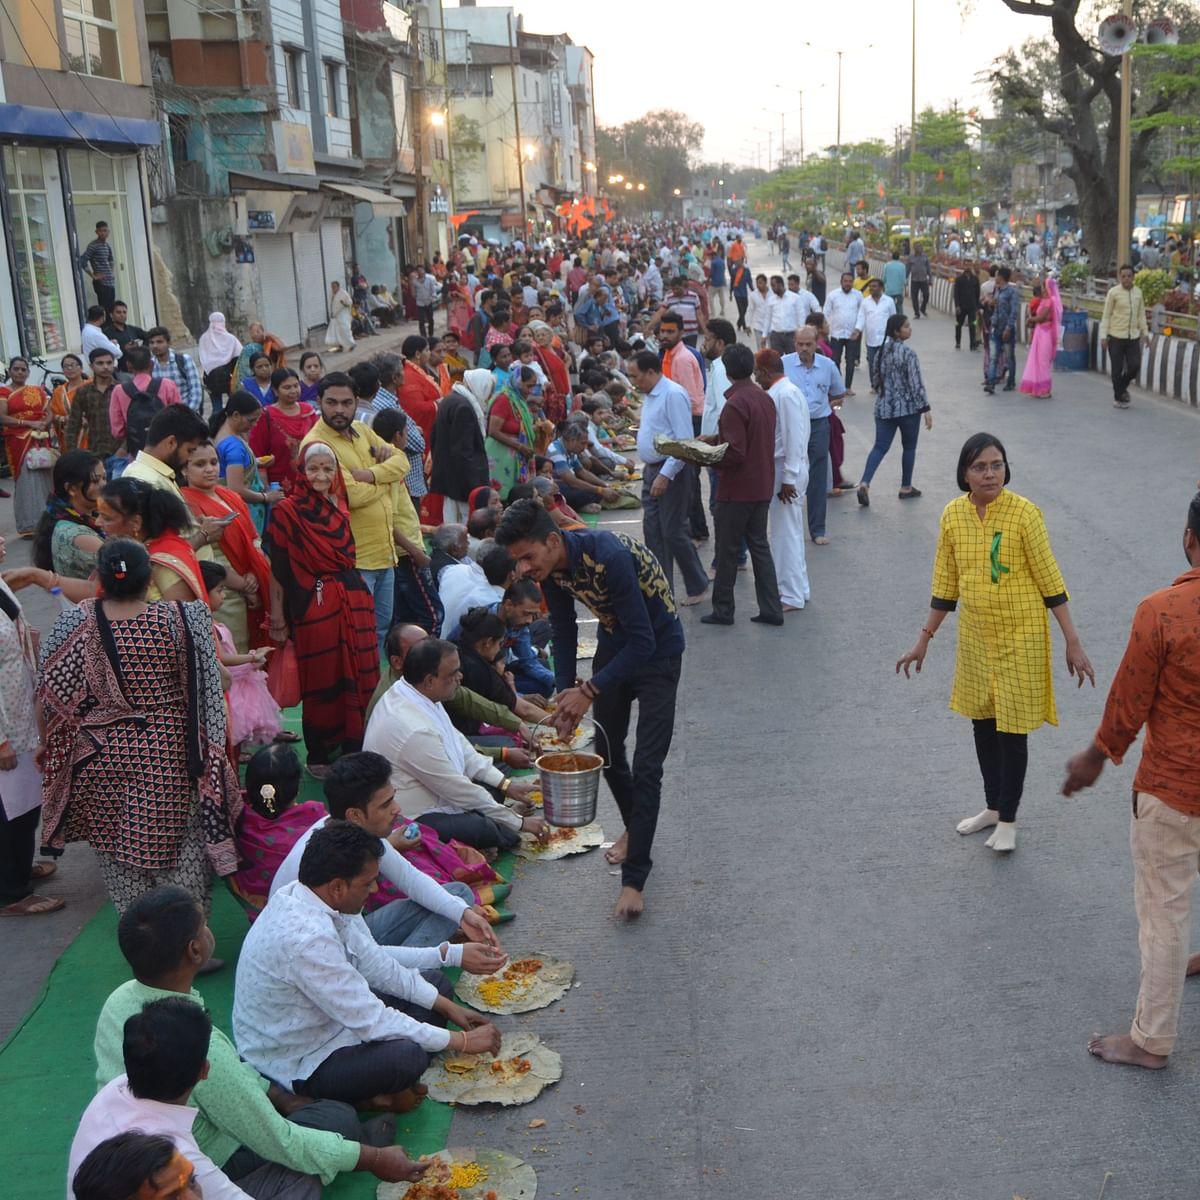 Indore: Over 10 lakh devotees attend 'Nagar Bhoj' at Pitreshwar Hanuman Dham